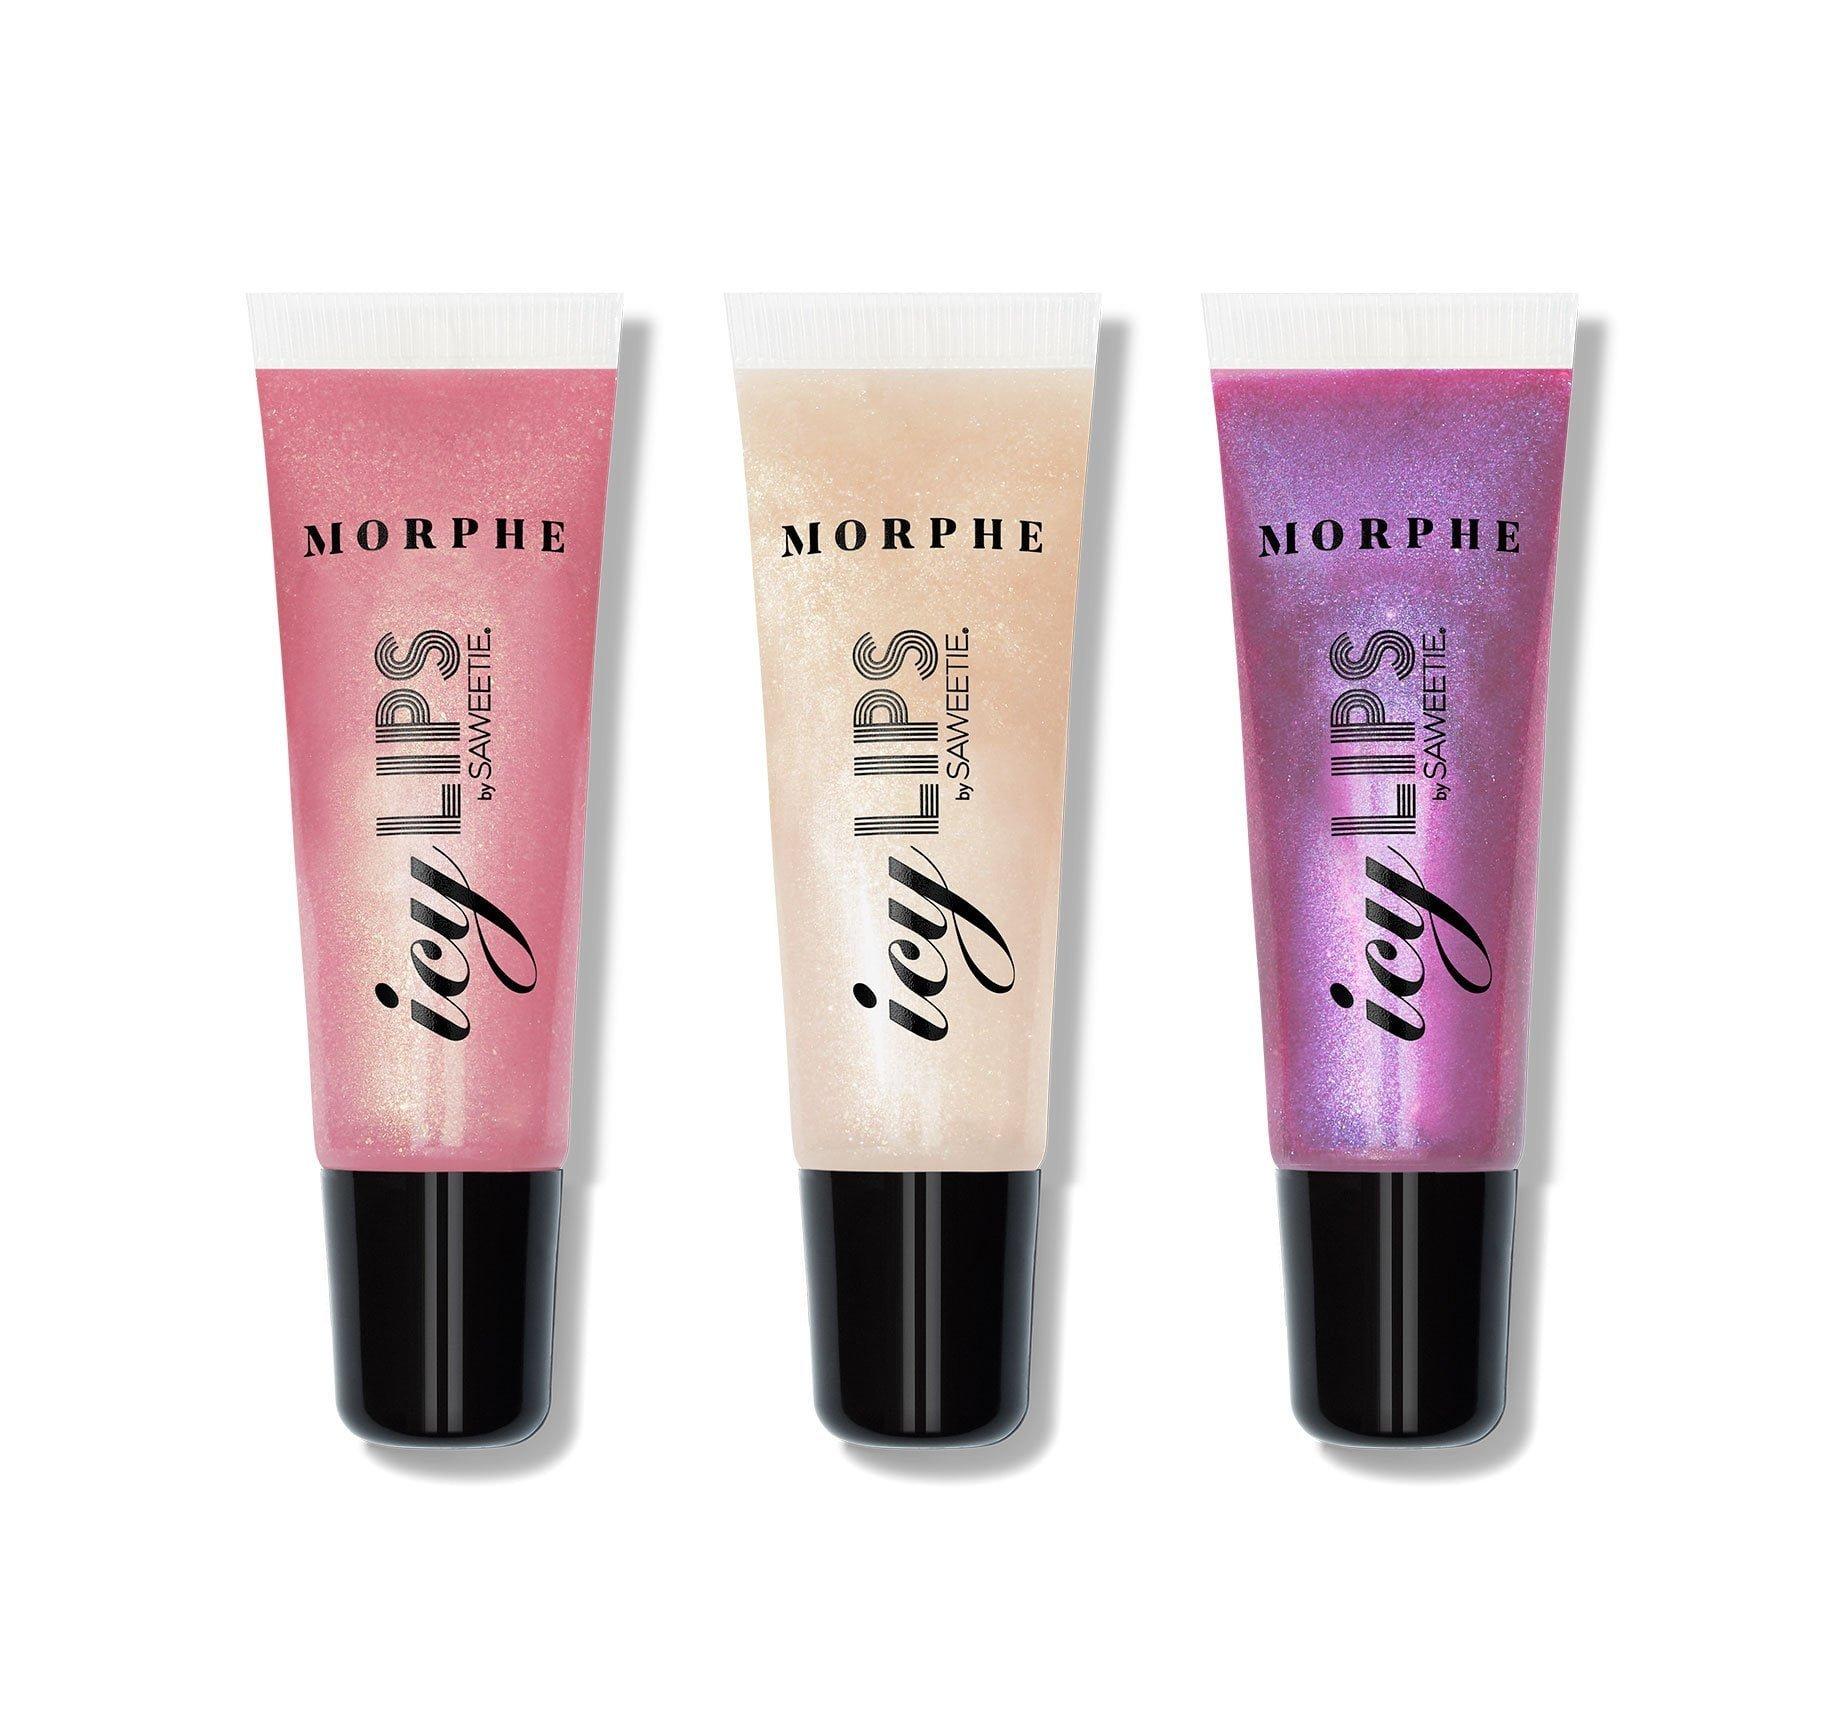 Morphe Icy Lips By Saweetie Lip Gloss Set